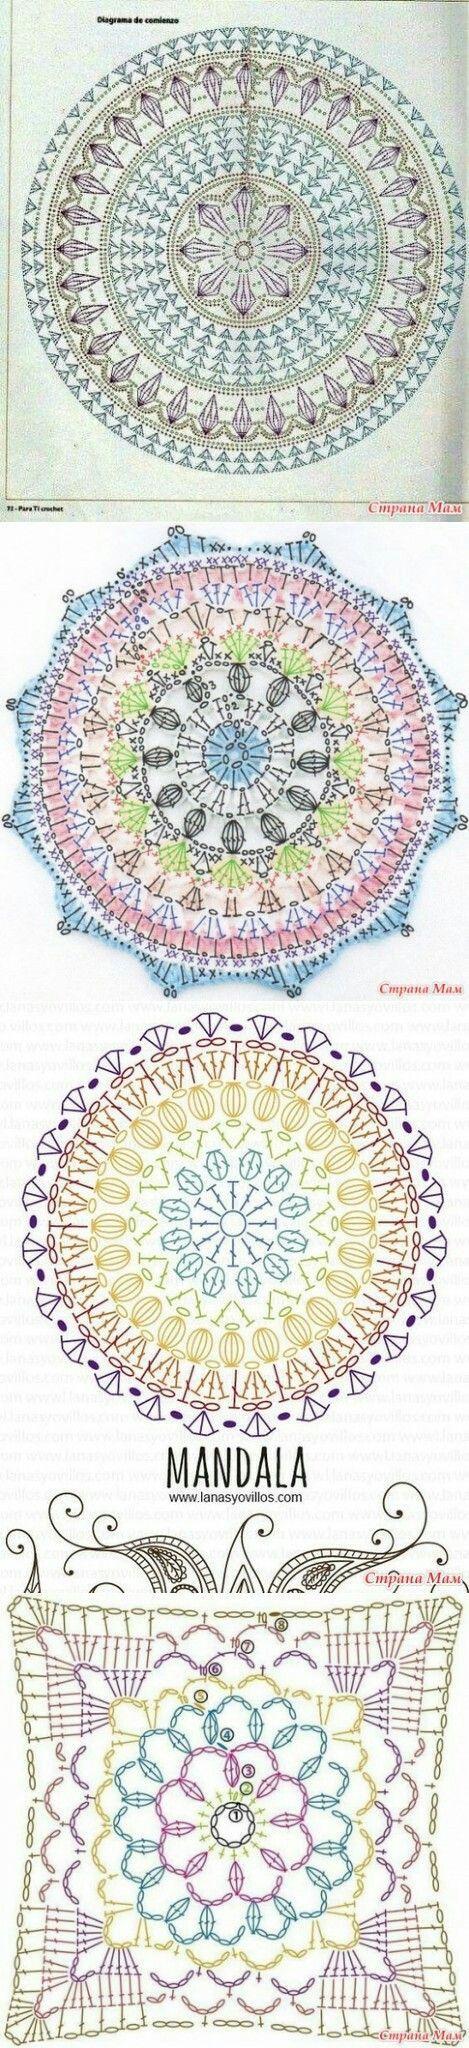 Christina Crochet Passion: Crochet blanket carpet designs